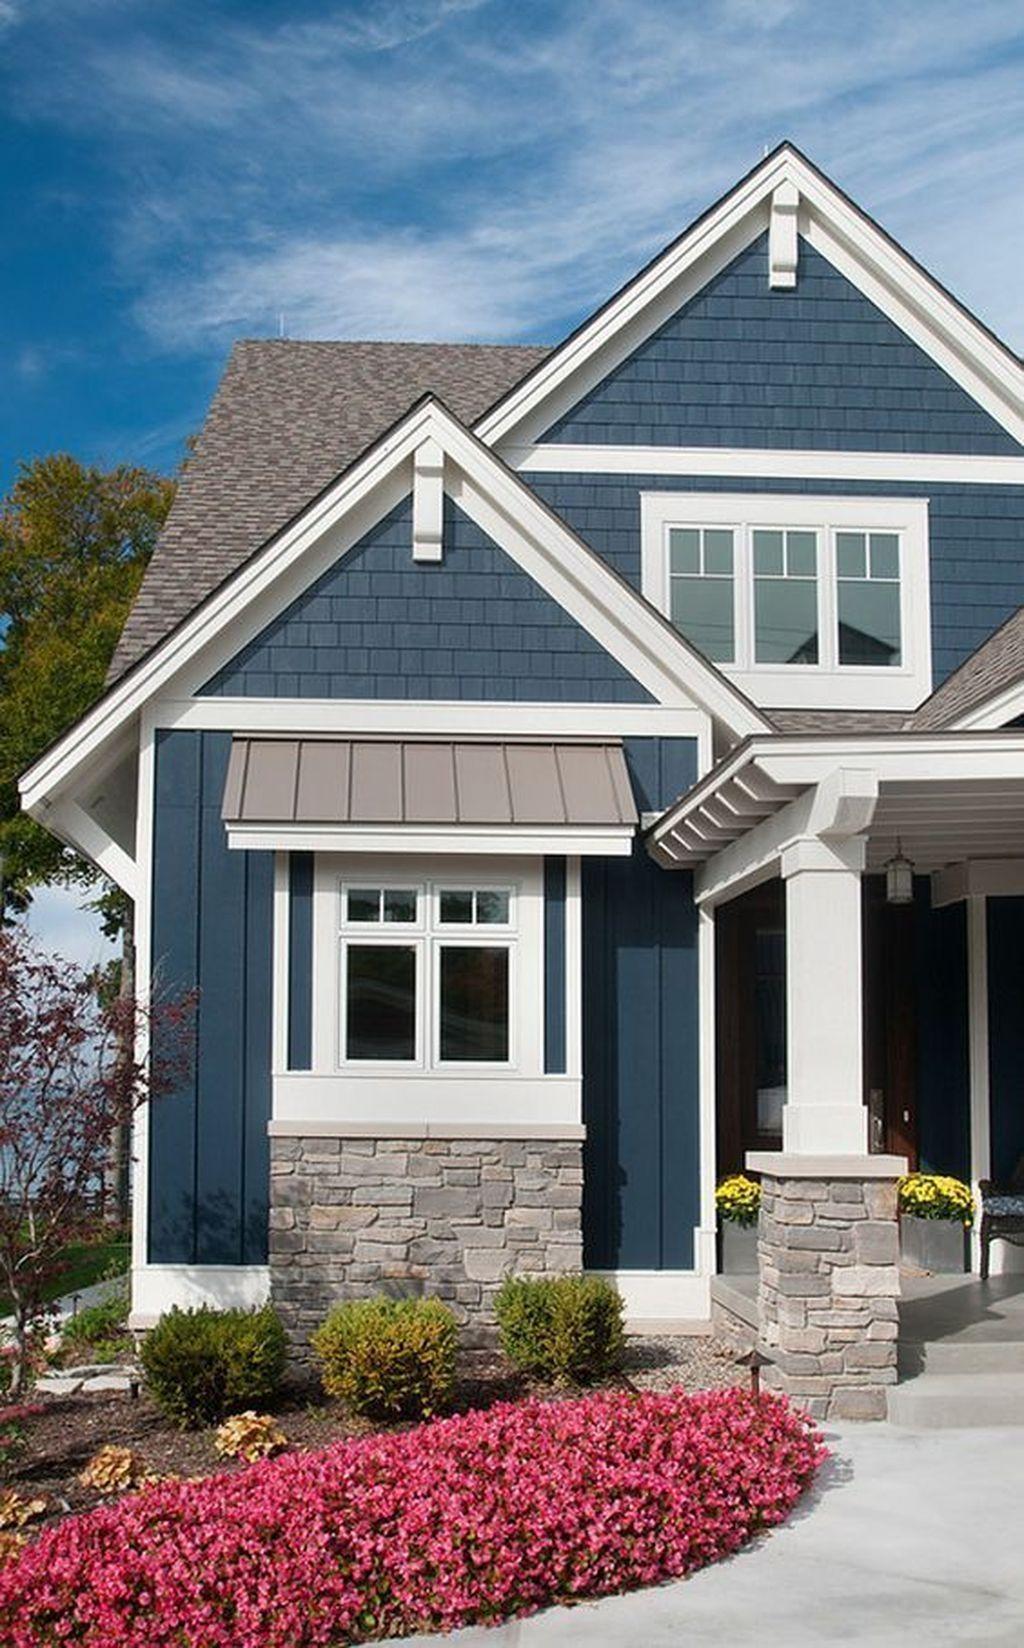 60 Modern Farmhouse Exterior Designs Ideas Https Herminiadecor Info 60 Modern Farmhouse Exteri Cottage Exterior Colors Lake Houses Exterior Cottage Exterior